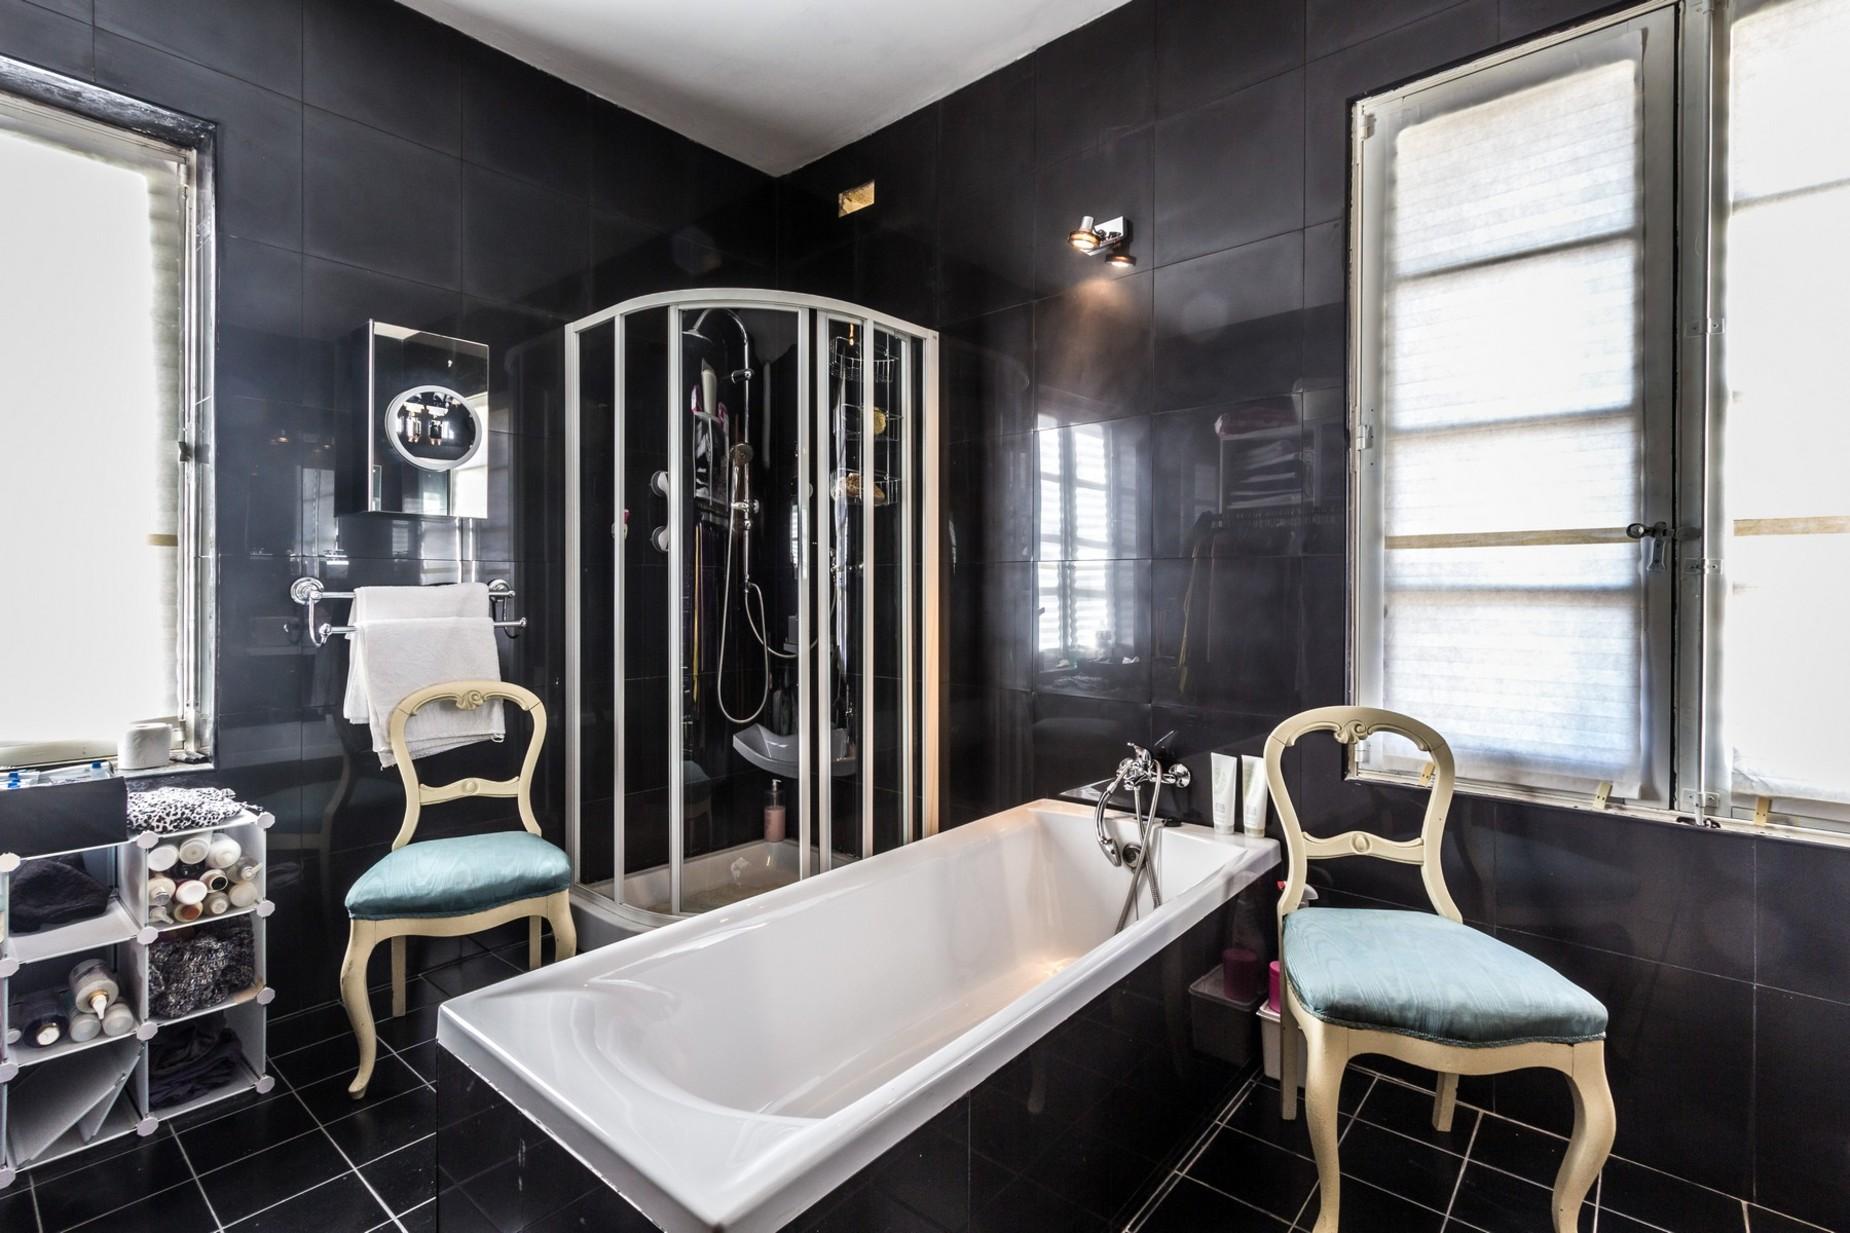 4 bed Town House For Sale in Senglea, Senglea - thumb 12